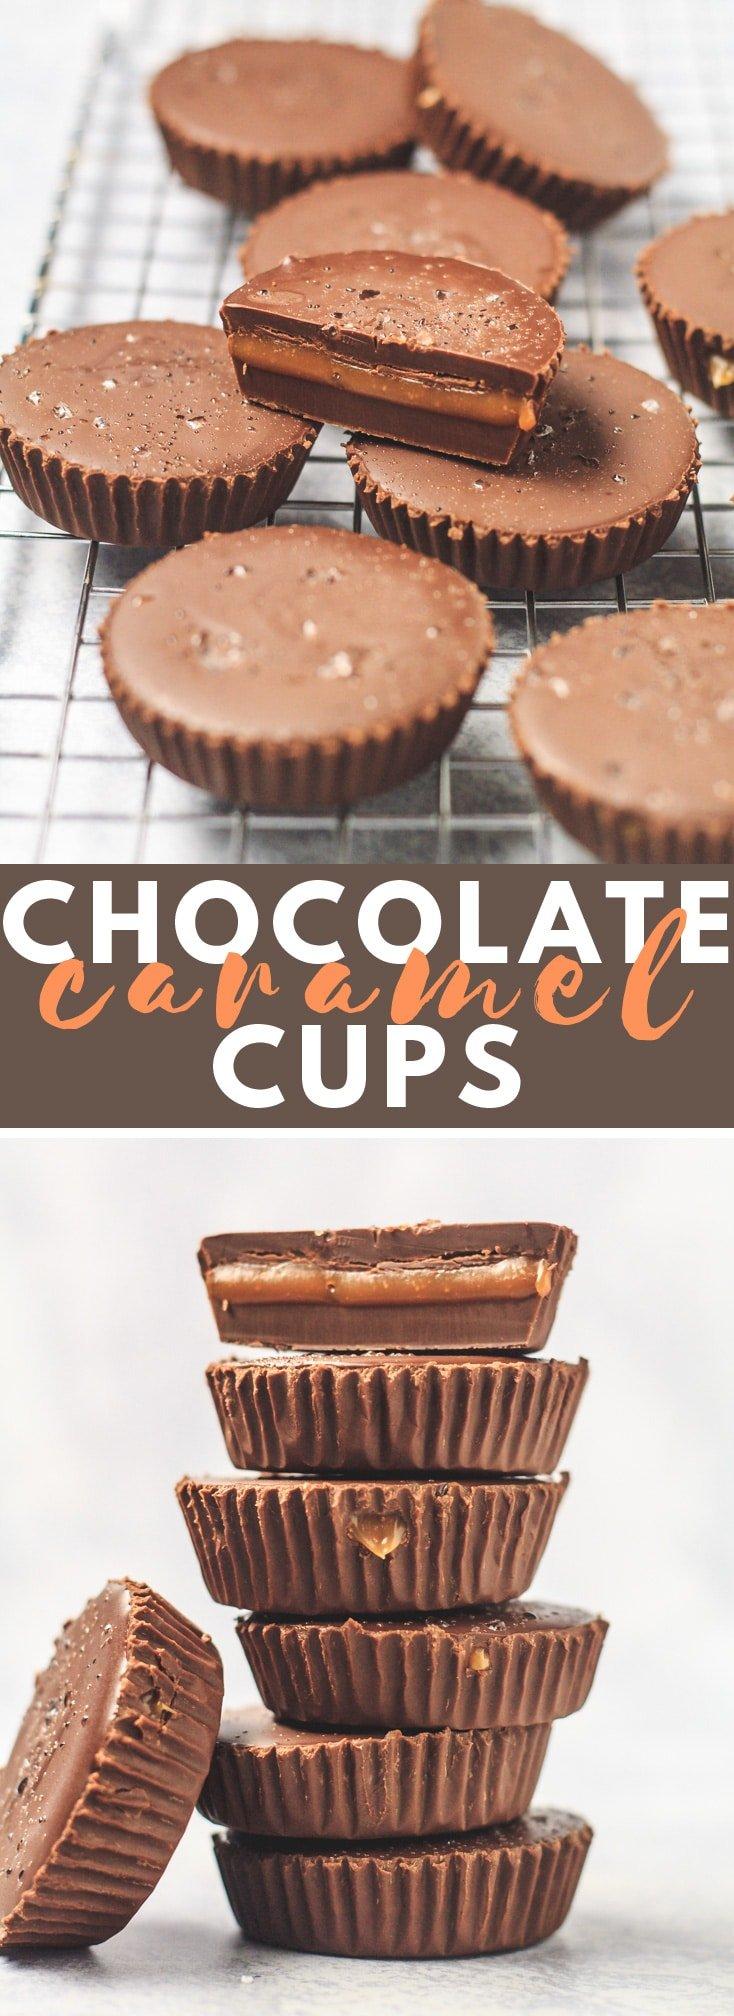 Salted Caramel Chocolate Cups